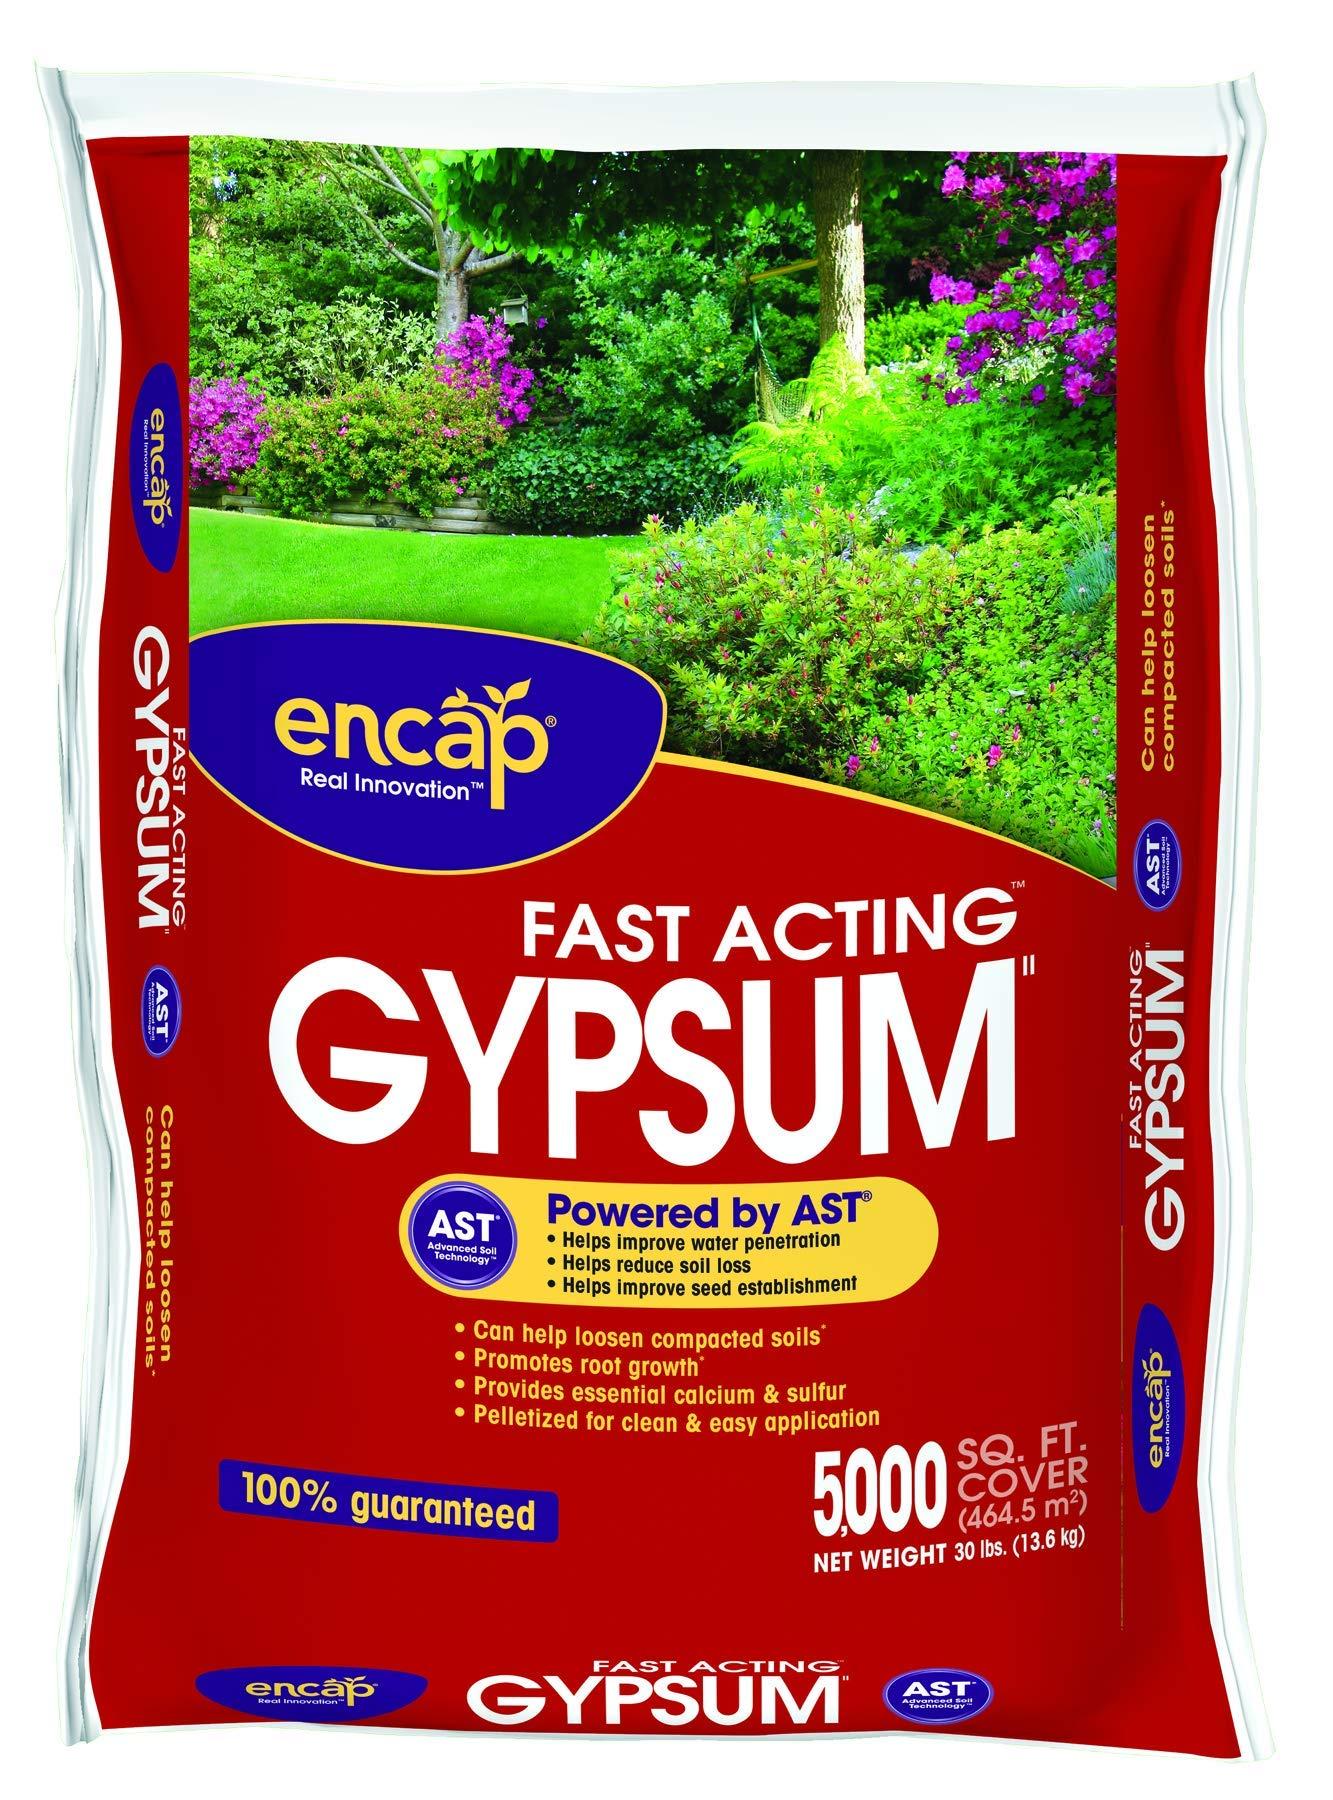 Encap 1061063 Gypsum Plus AST Coverage, 30-Pound by Flagline